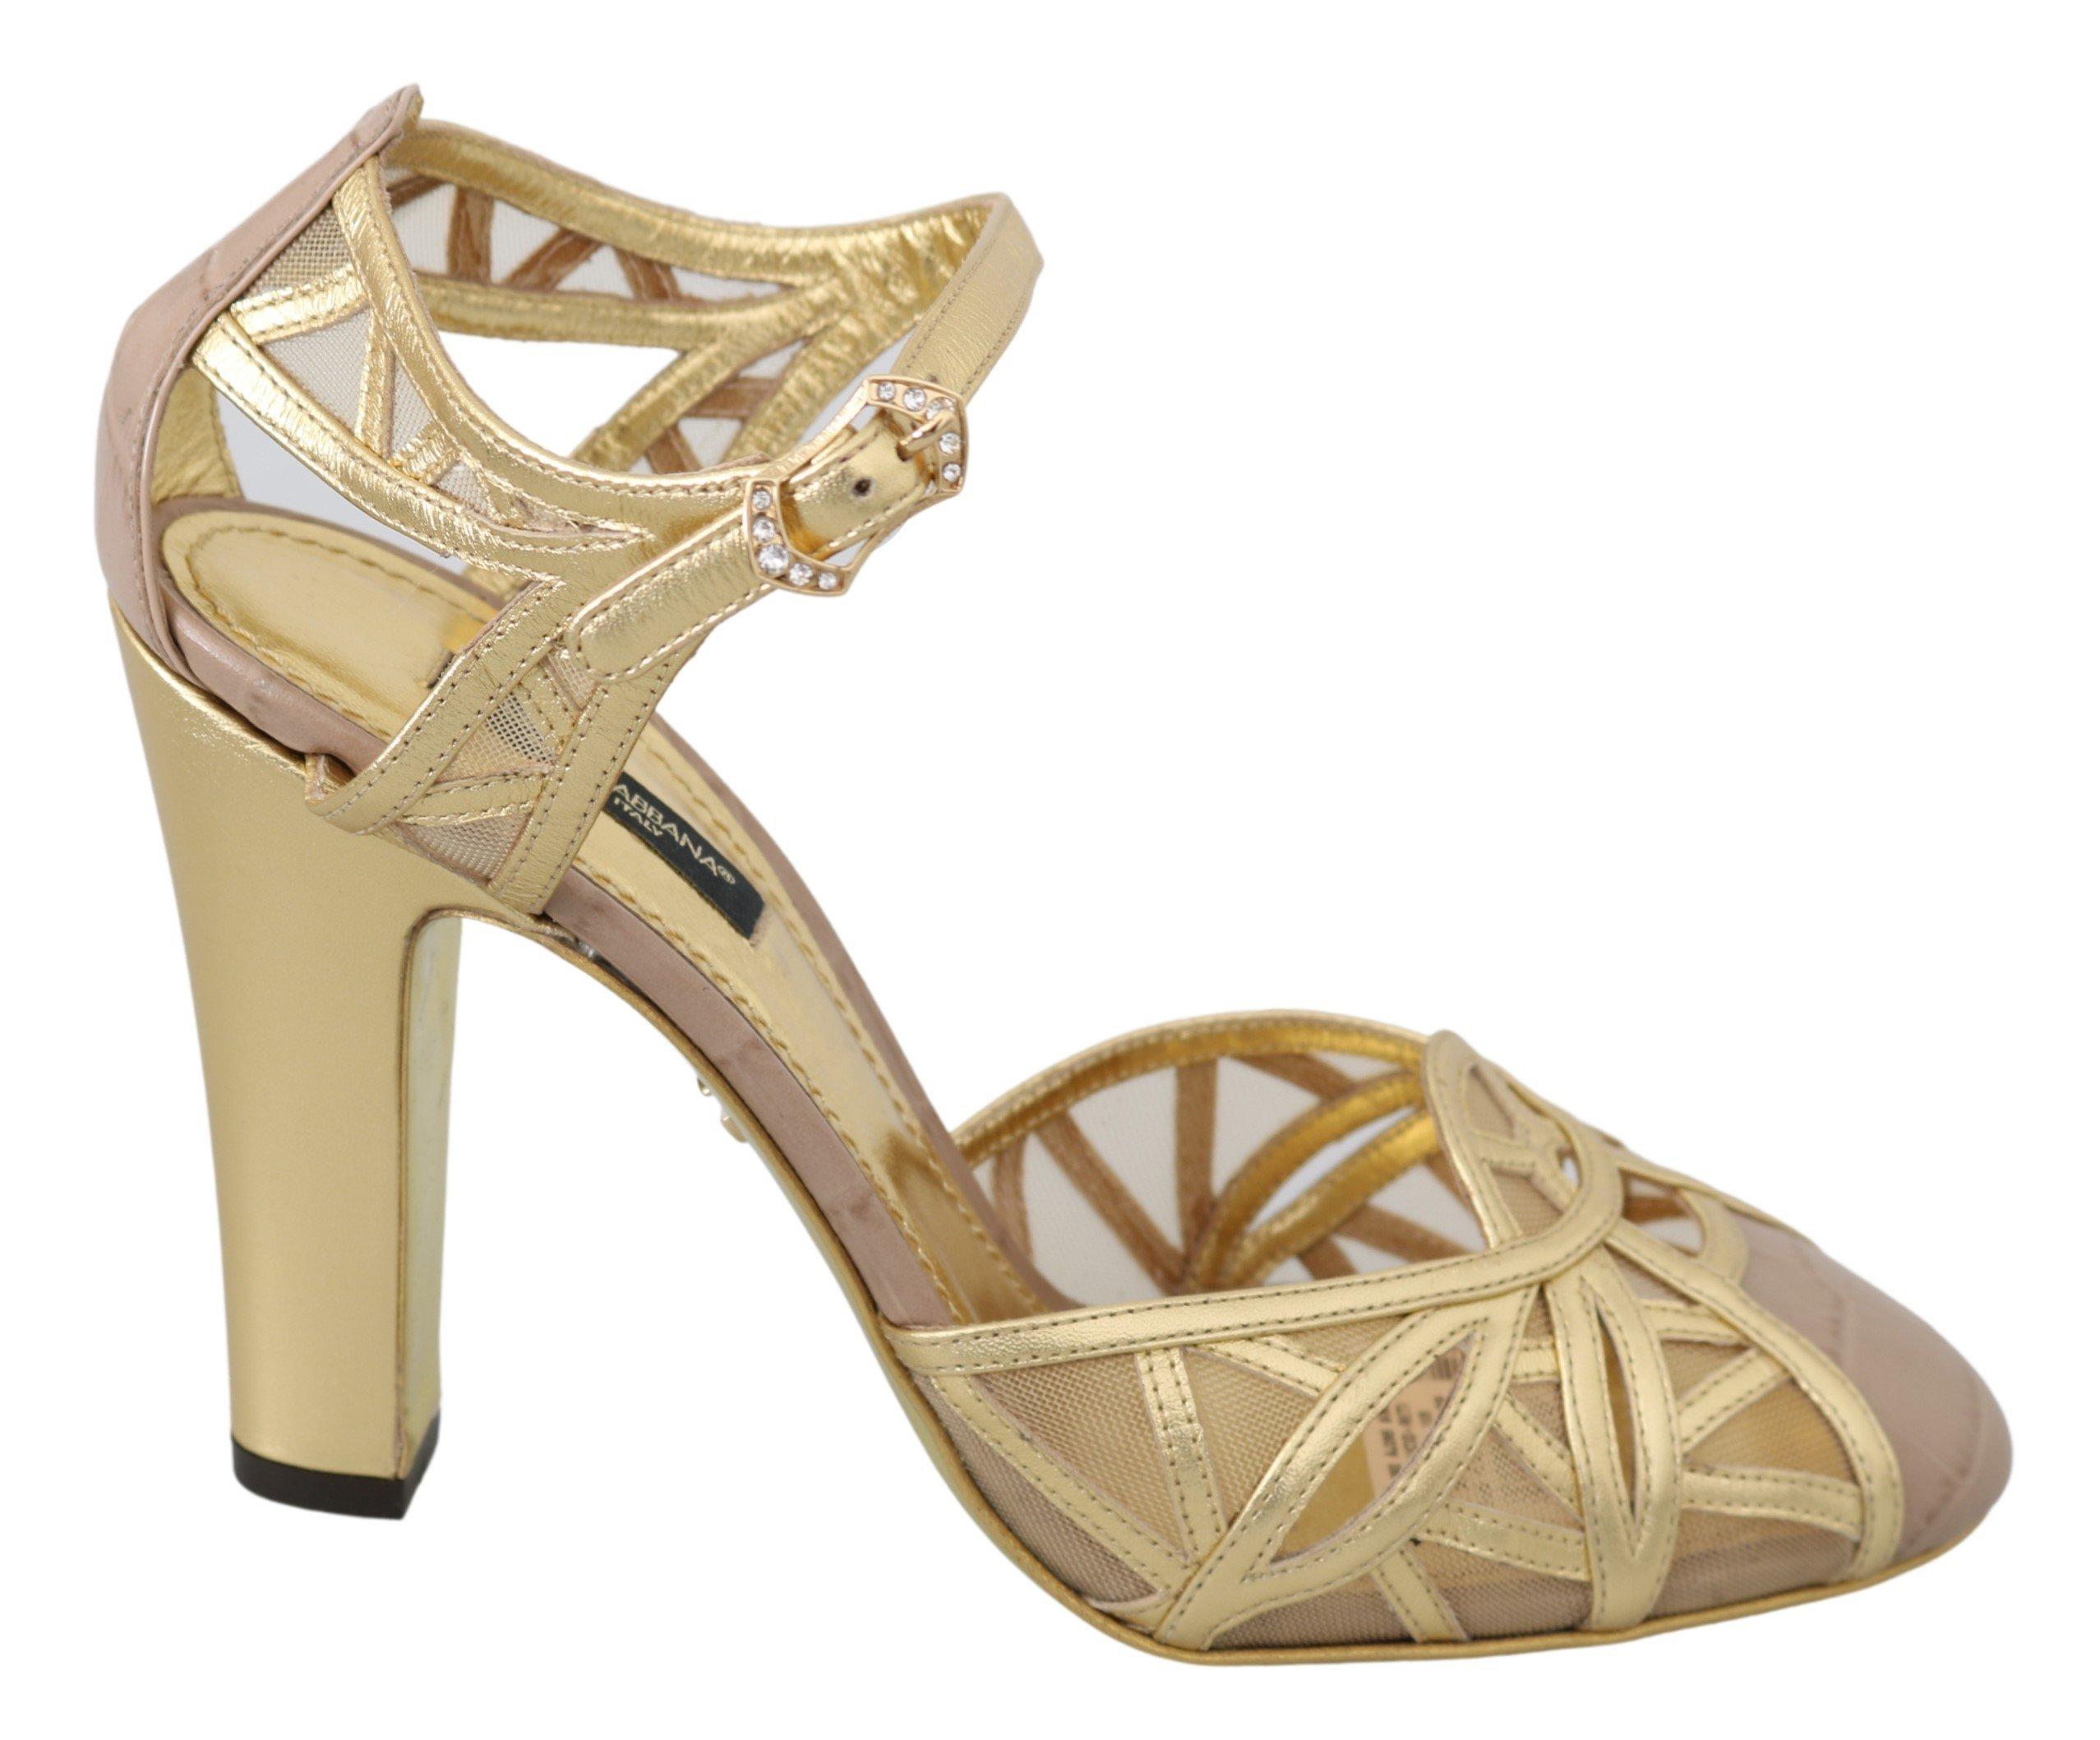 Dolce & Gabbana Women's Leather Ankle Strap Sandals Gold LA6806 - EU38/US7.5